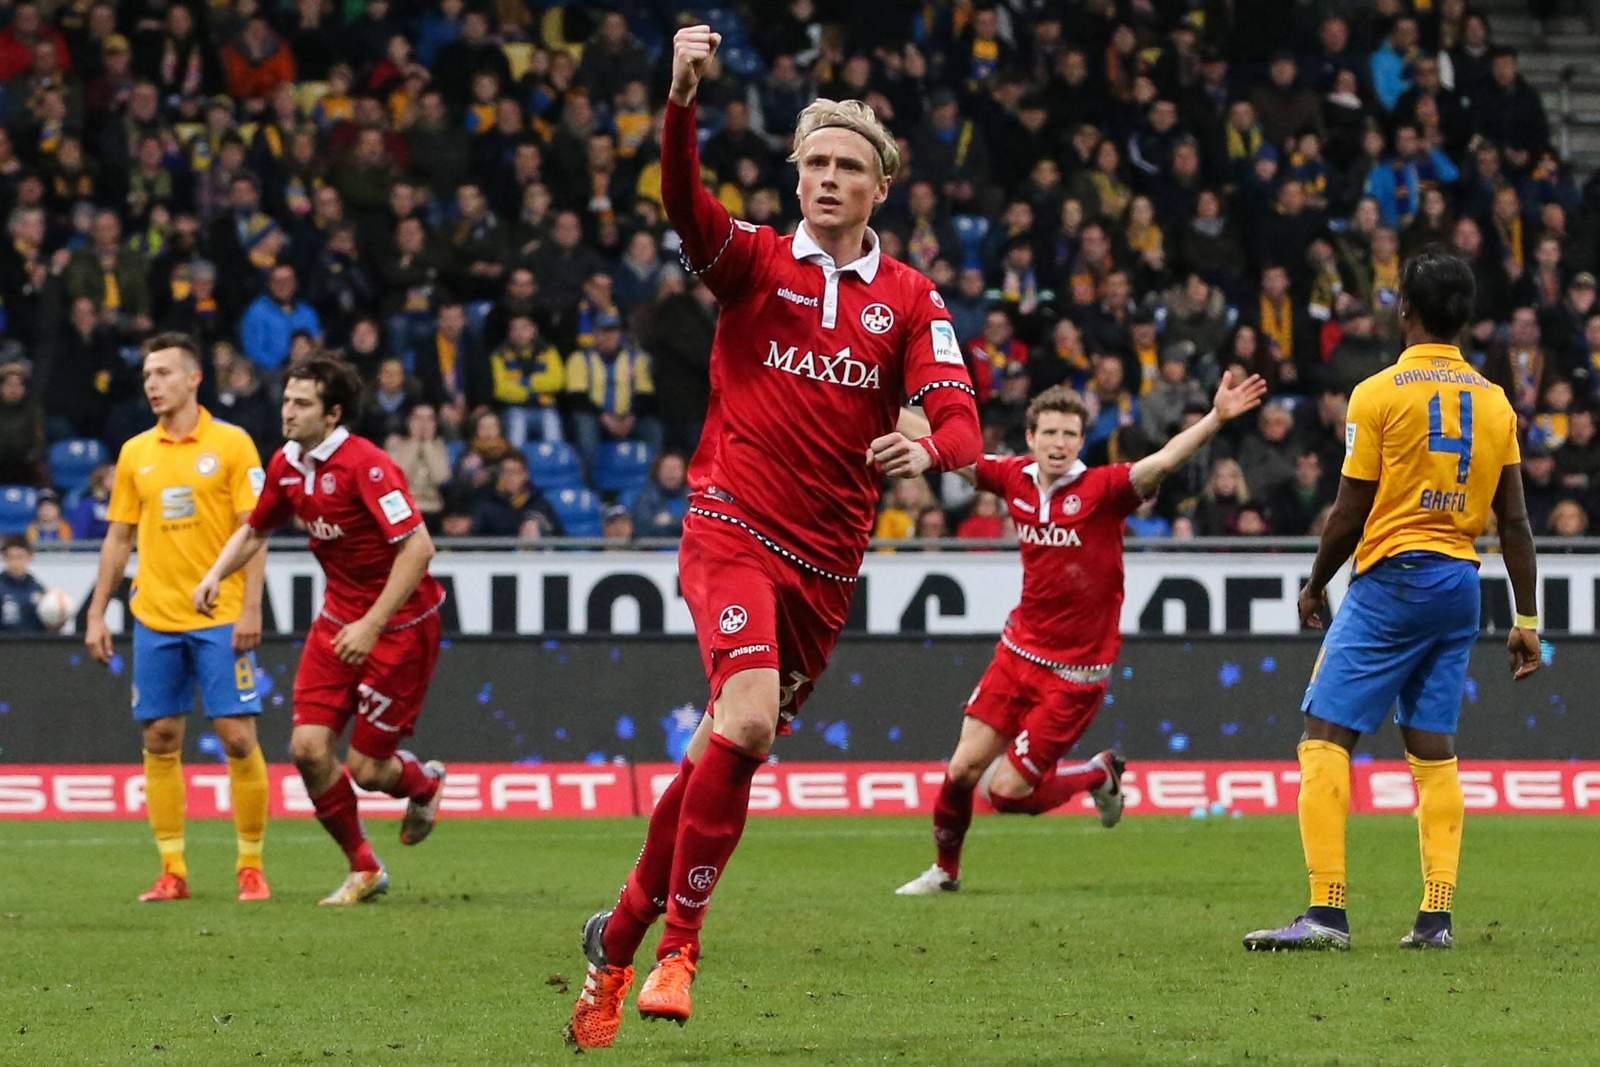 Tim Heubach jubelt nach Tor gegen Braunschweig